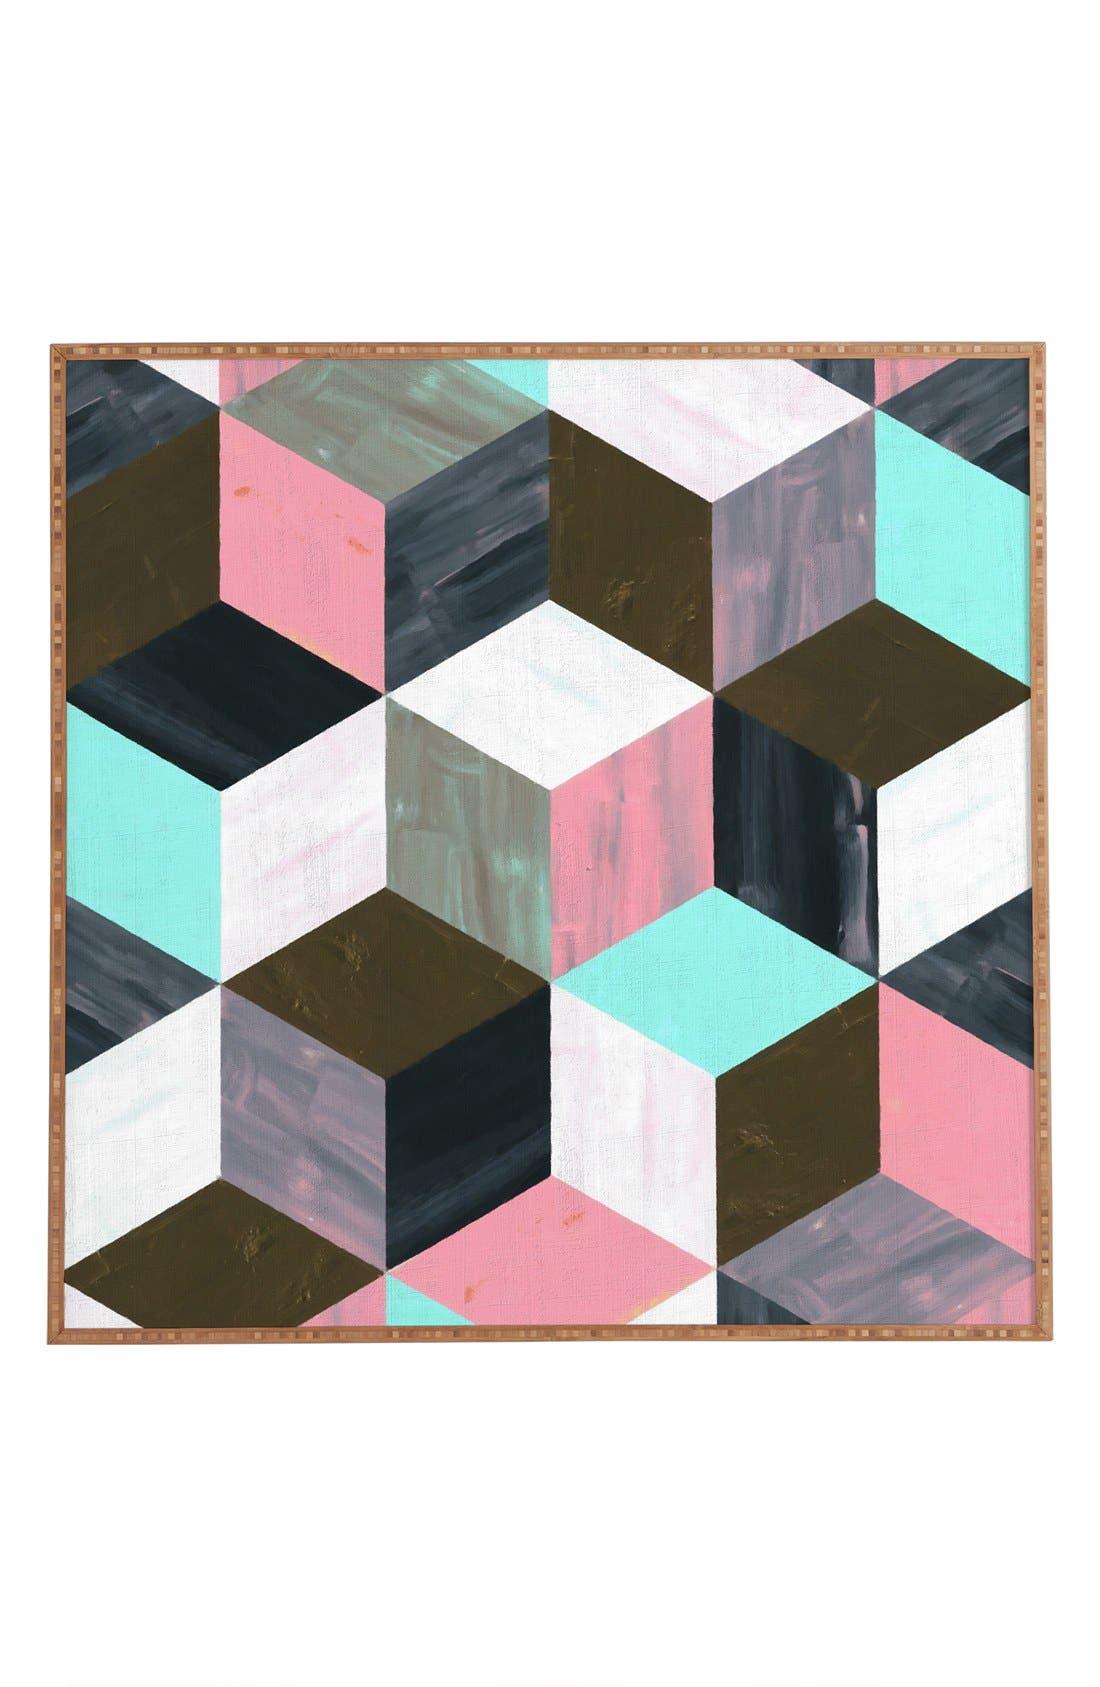 Alternate Image 1 Selected - Deny Designs 'The Runaway' Framed Wall Art